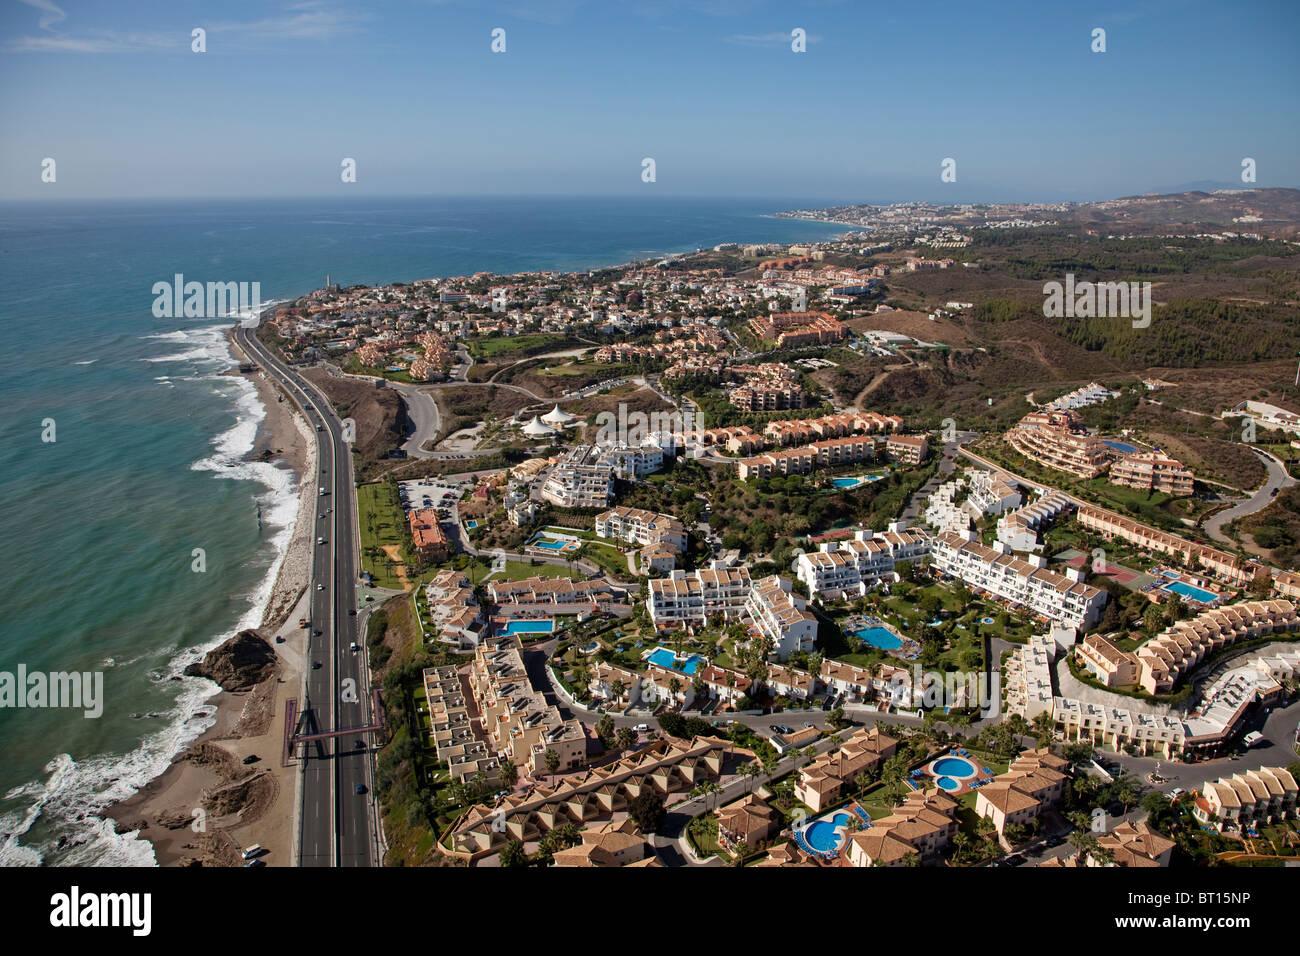 Vista aerea de mijas costa m laga costa del sol andaluc a espa a stock photo 31988594 alamy - Fotografia aerea malaga ...